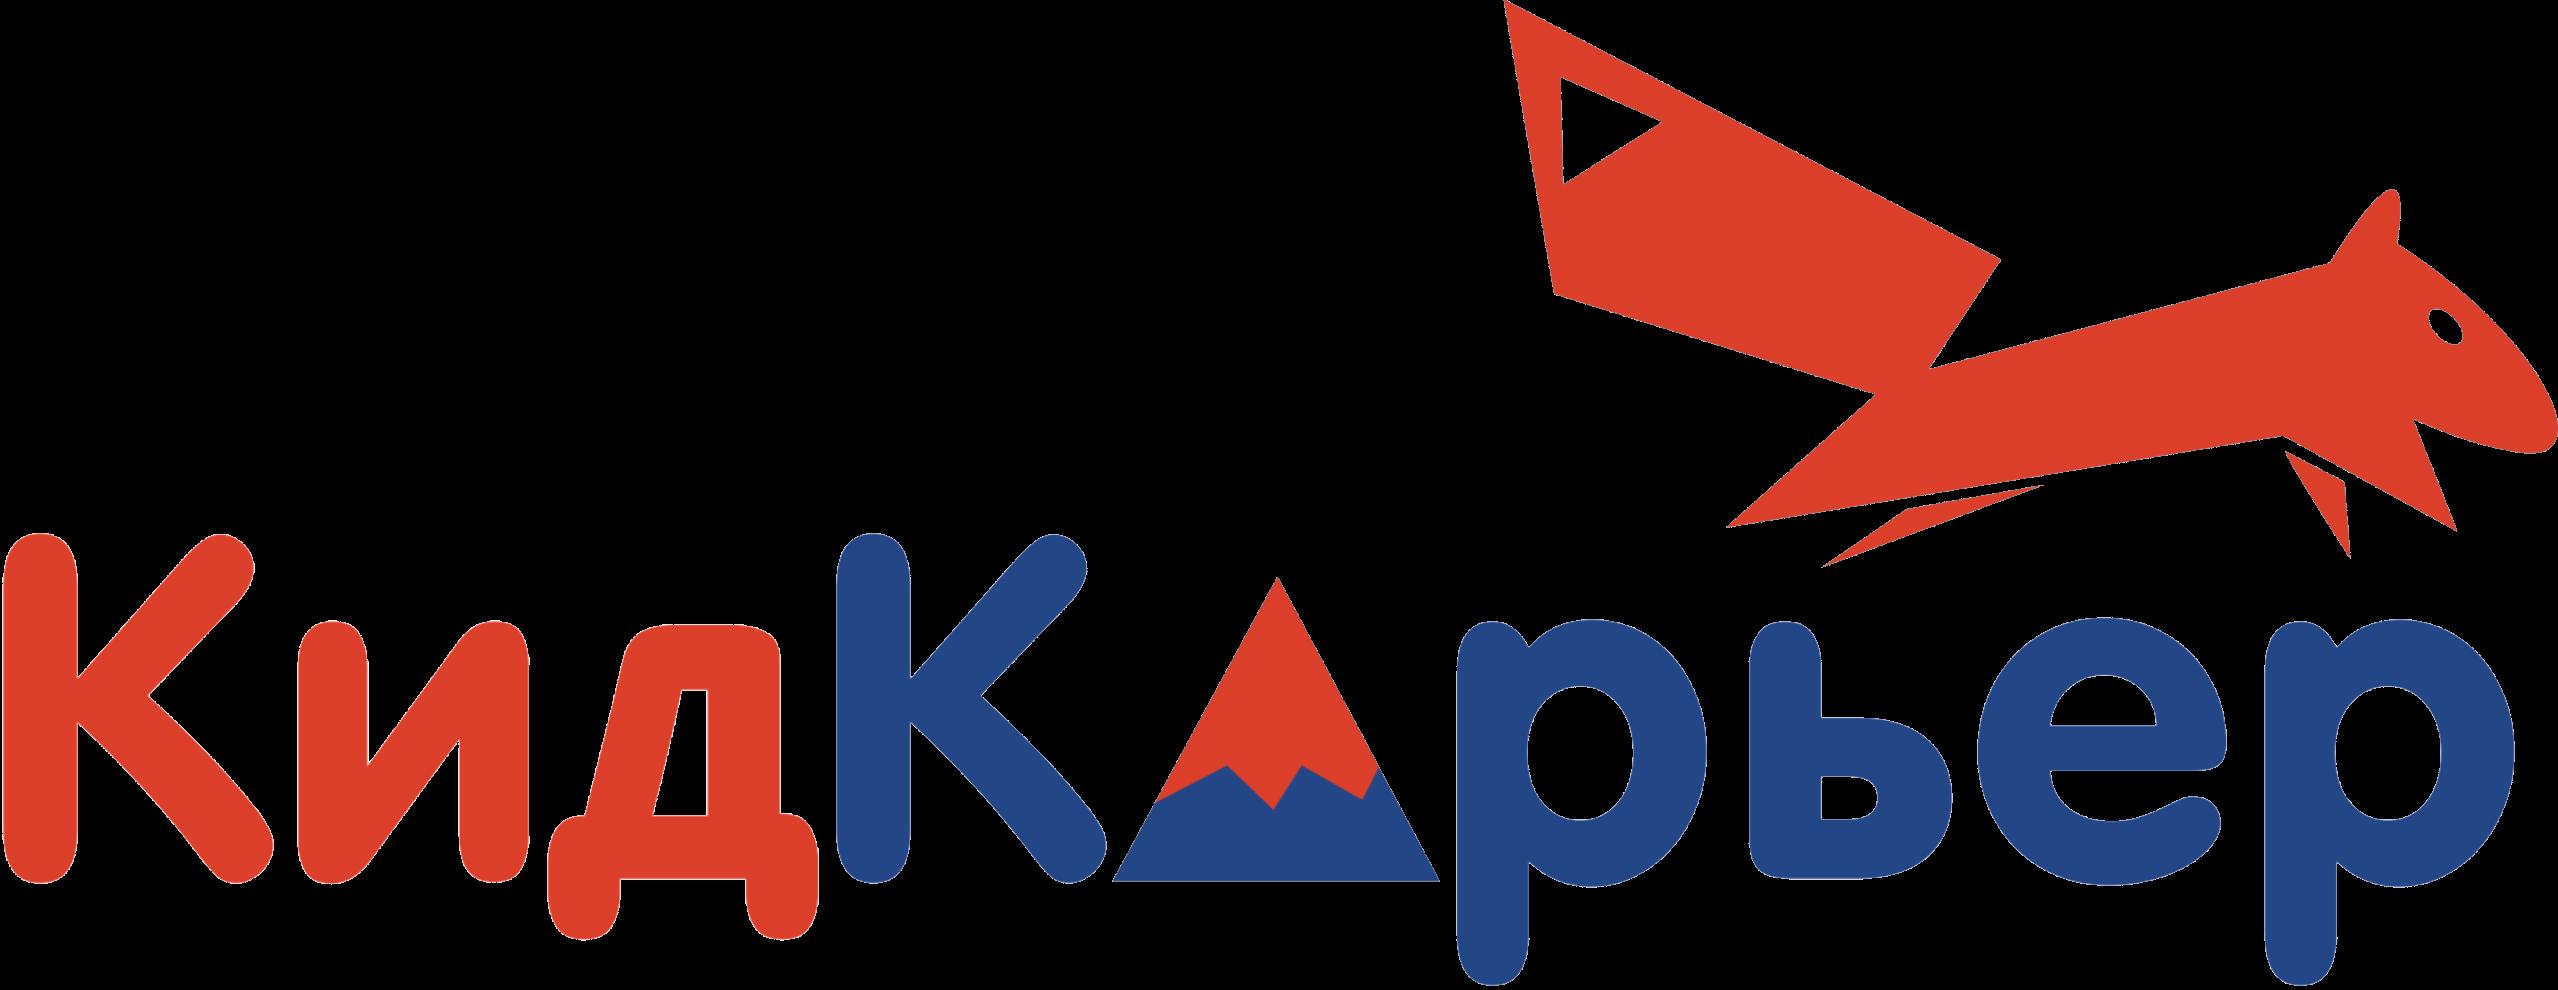 KidCareer - школа блогинга для детей